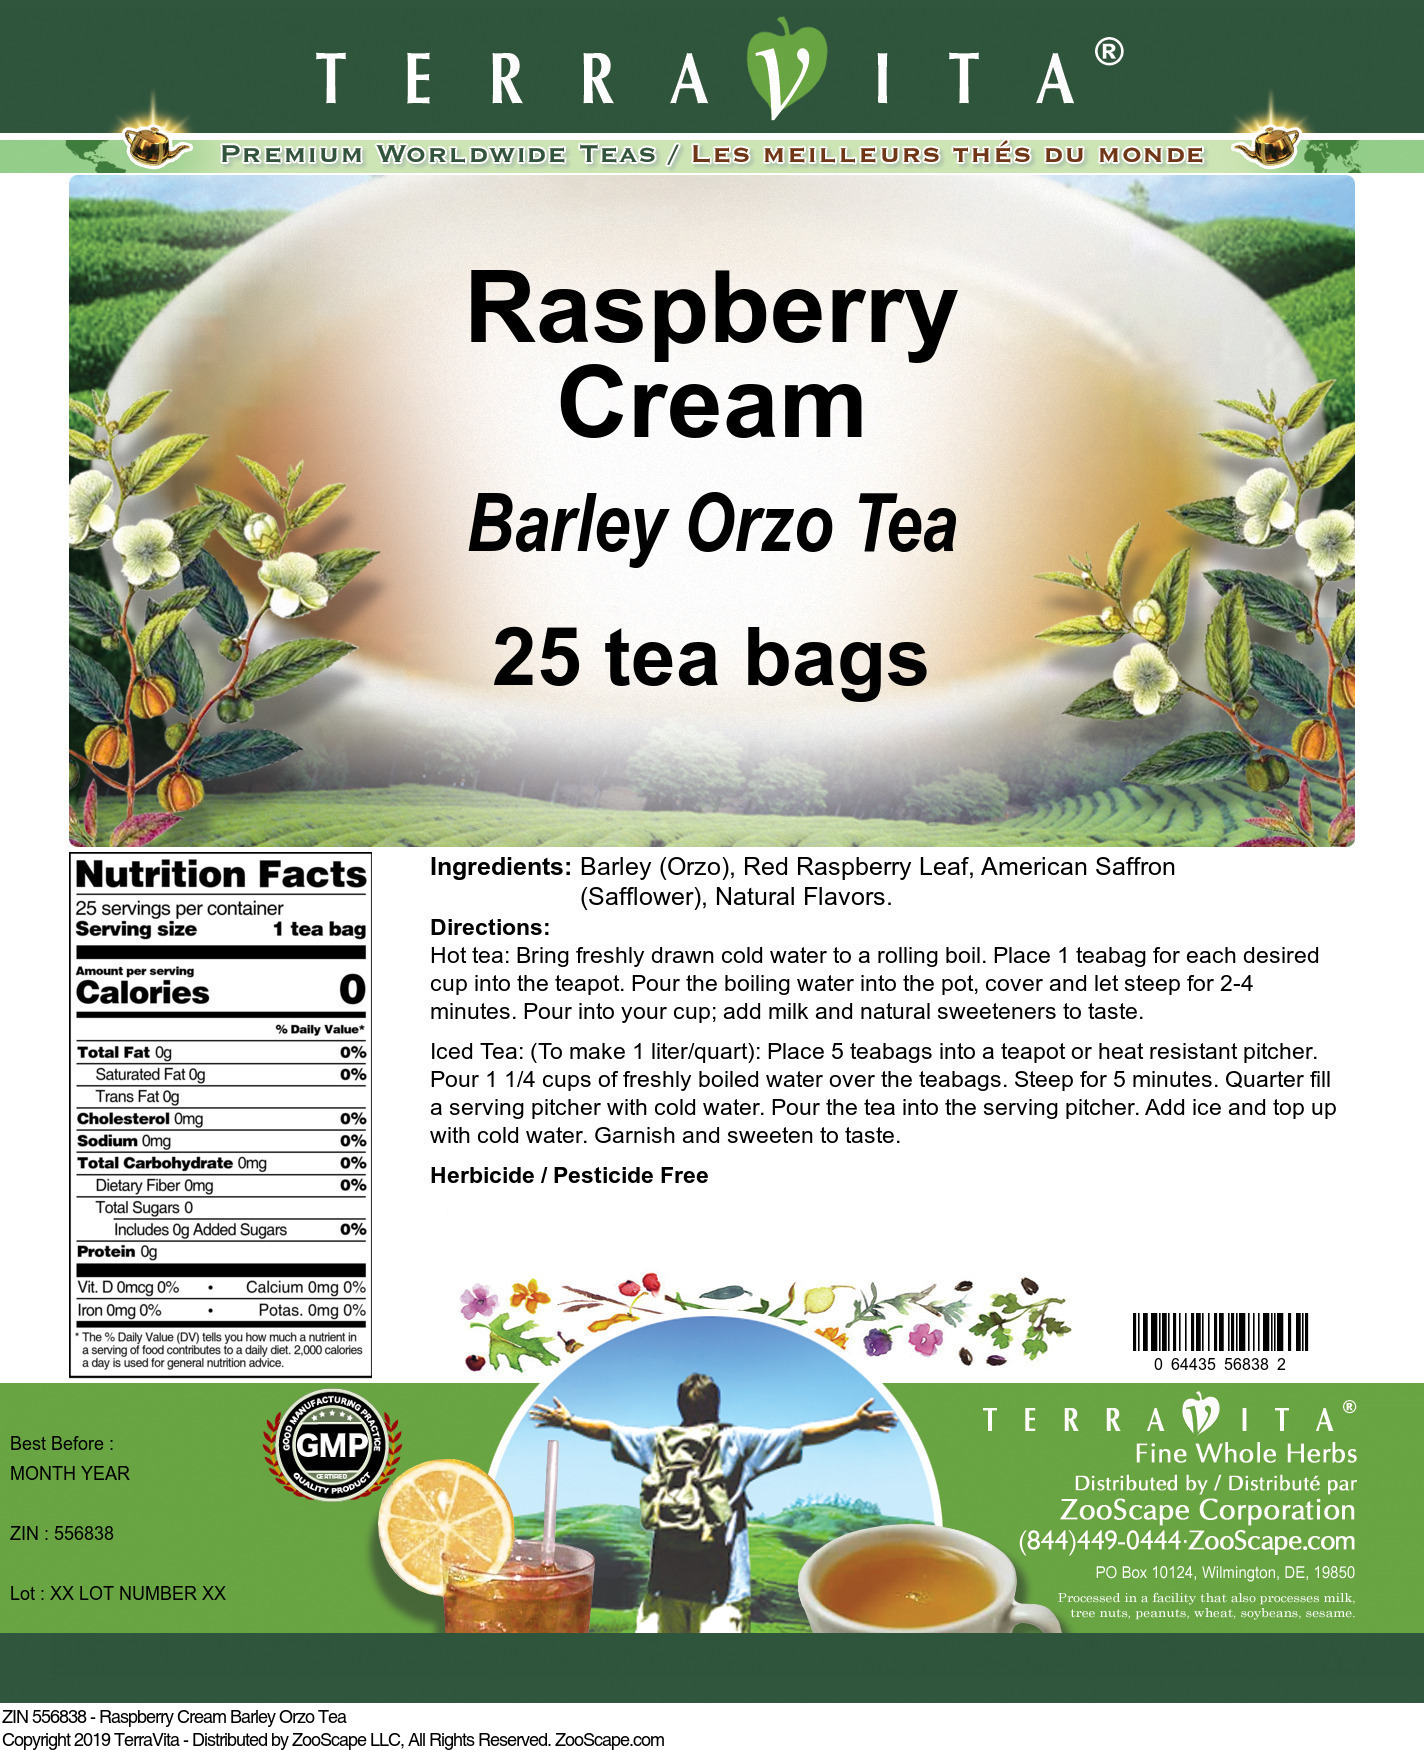 Raspberry Cream Barley Orzo Tea